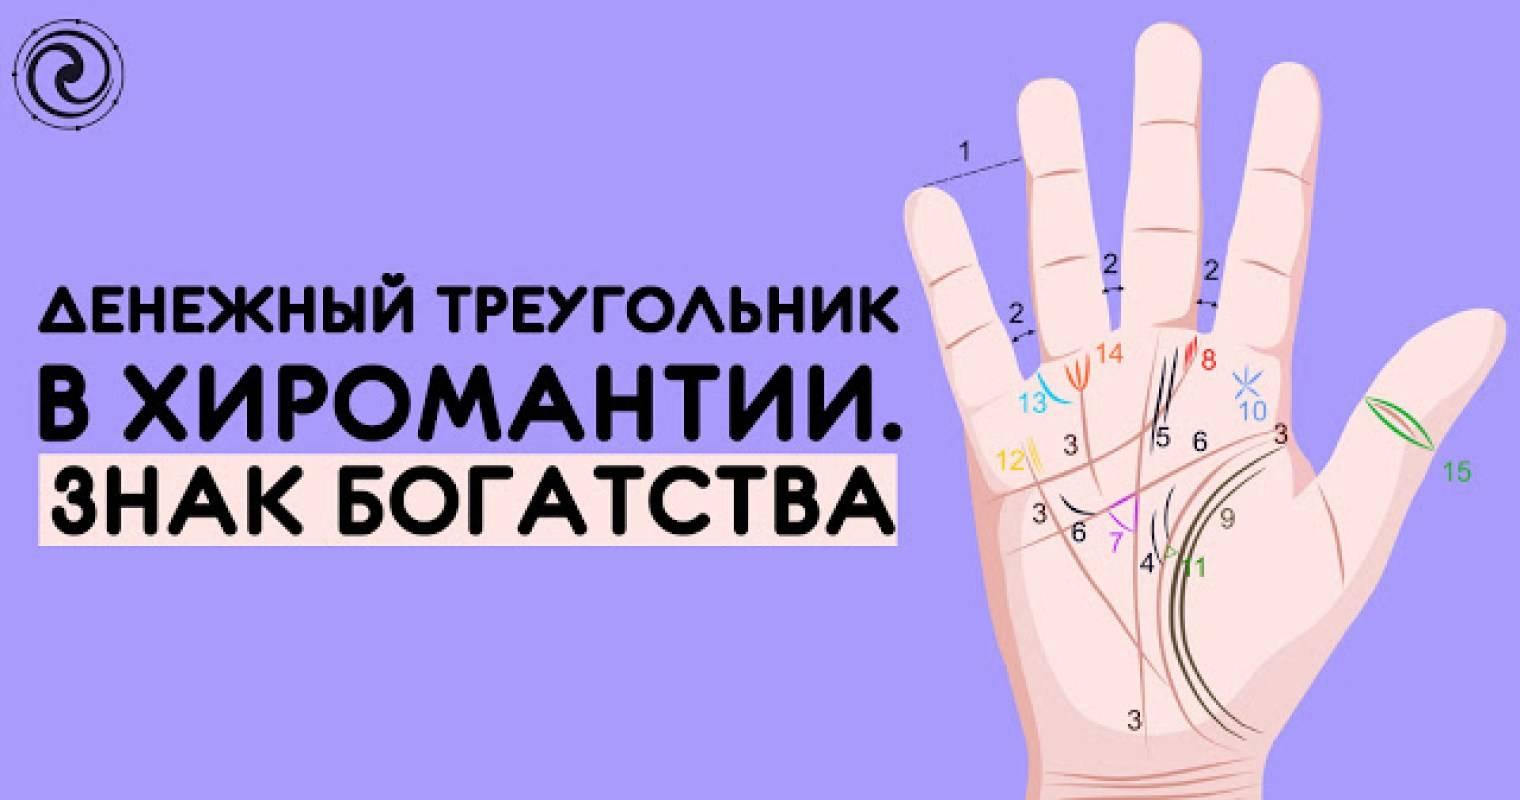 Линия денег на руке — знак богатства в хиромантии